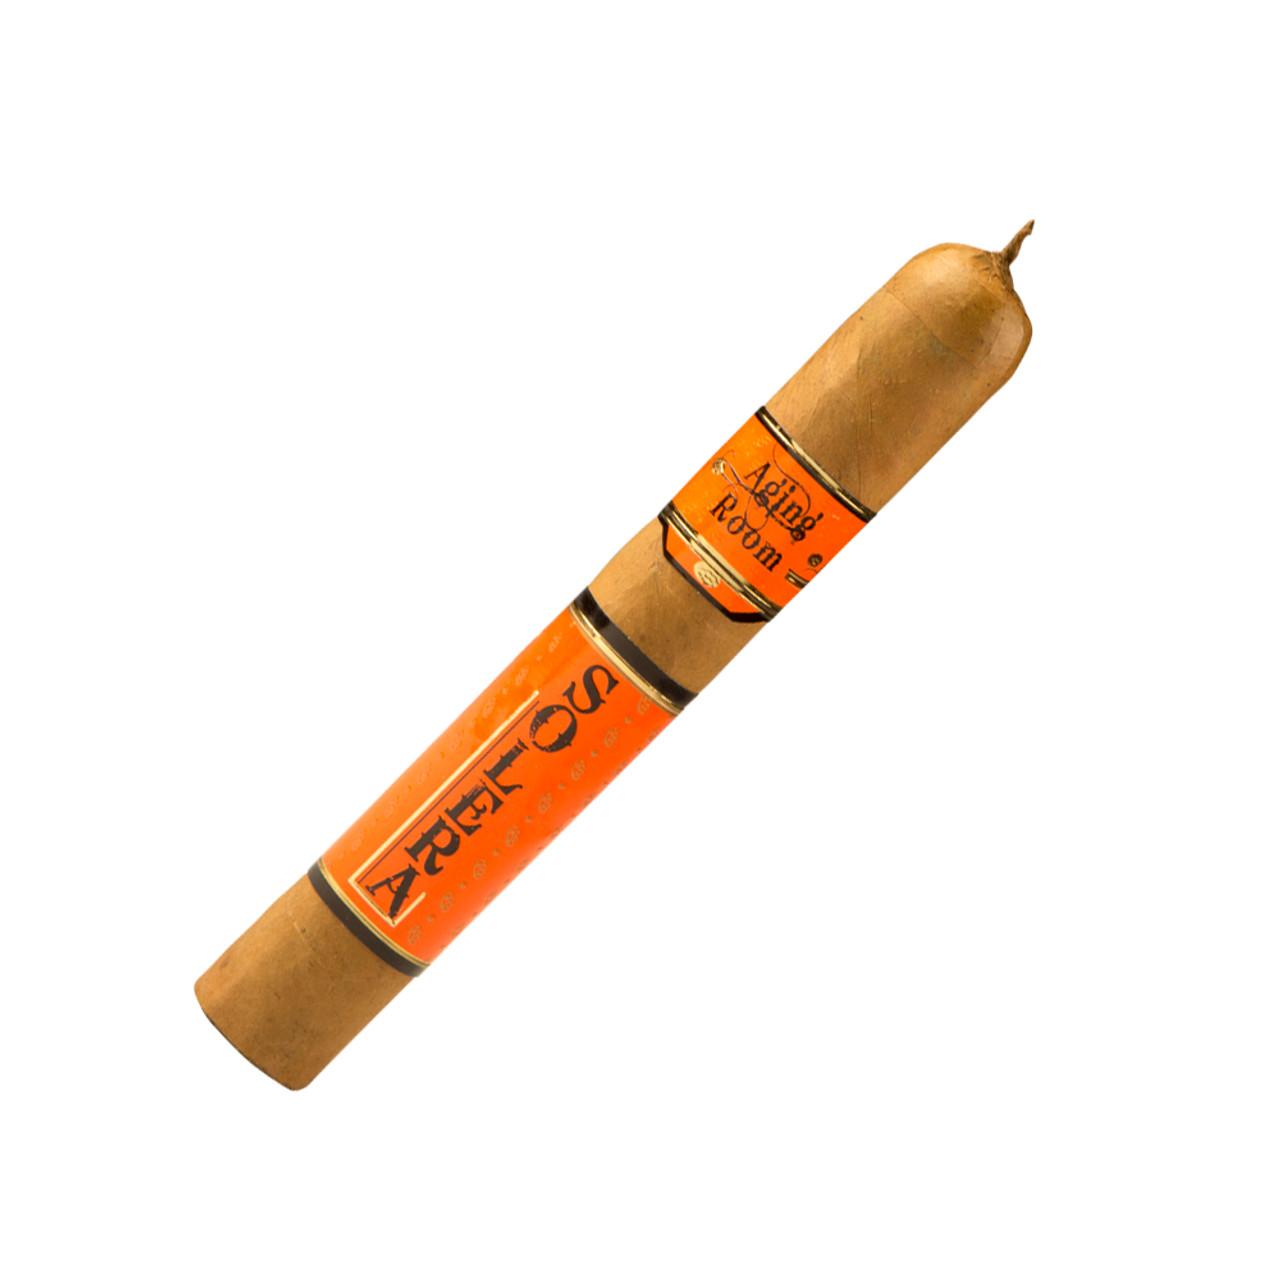 Aging Room Solera Fantastico Shade Cigars - 5.75 x 54 (Box of 21)